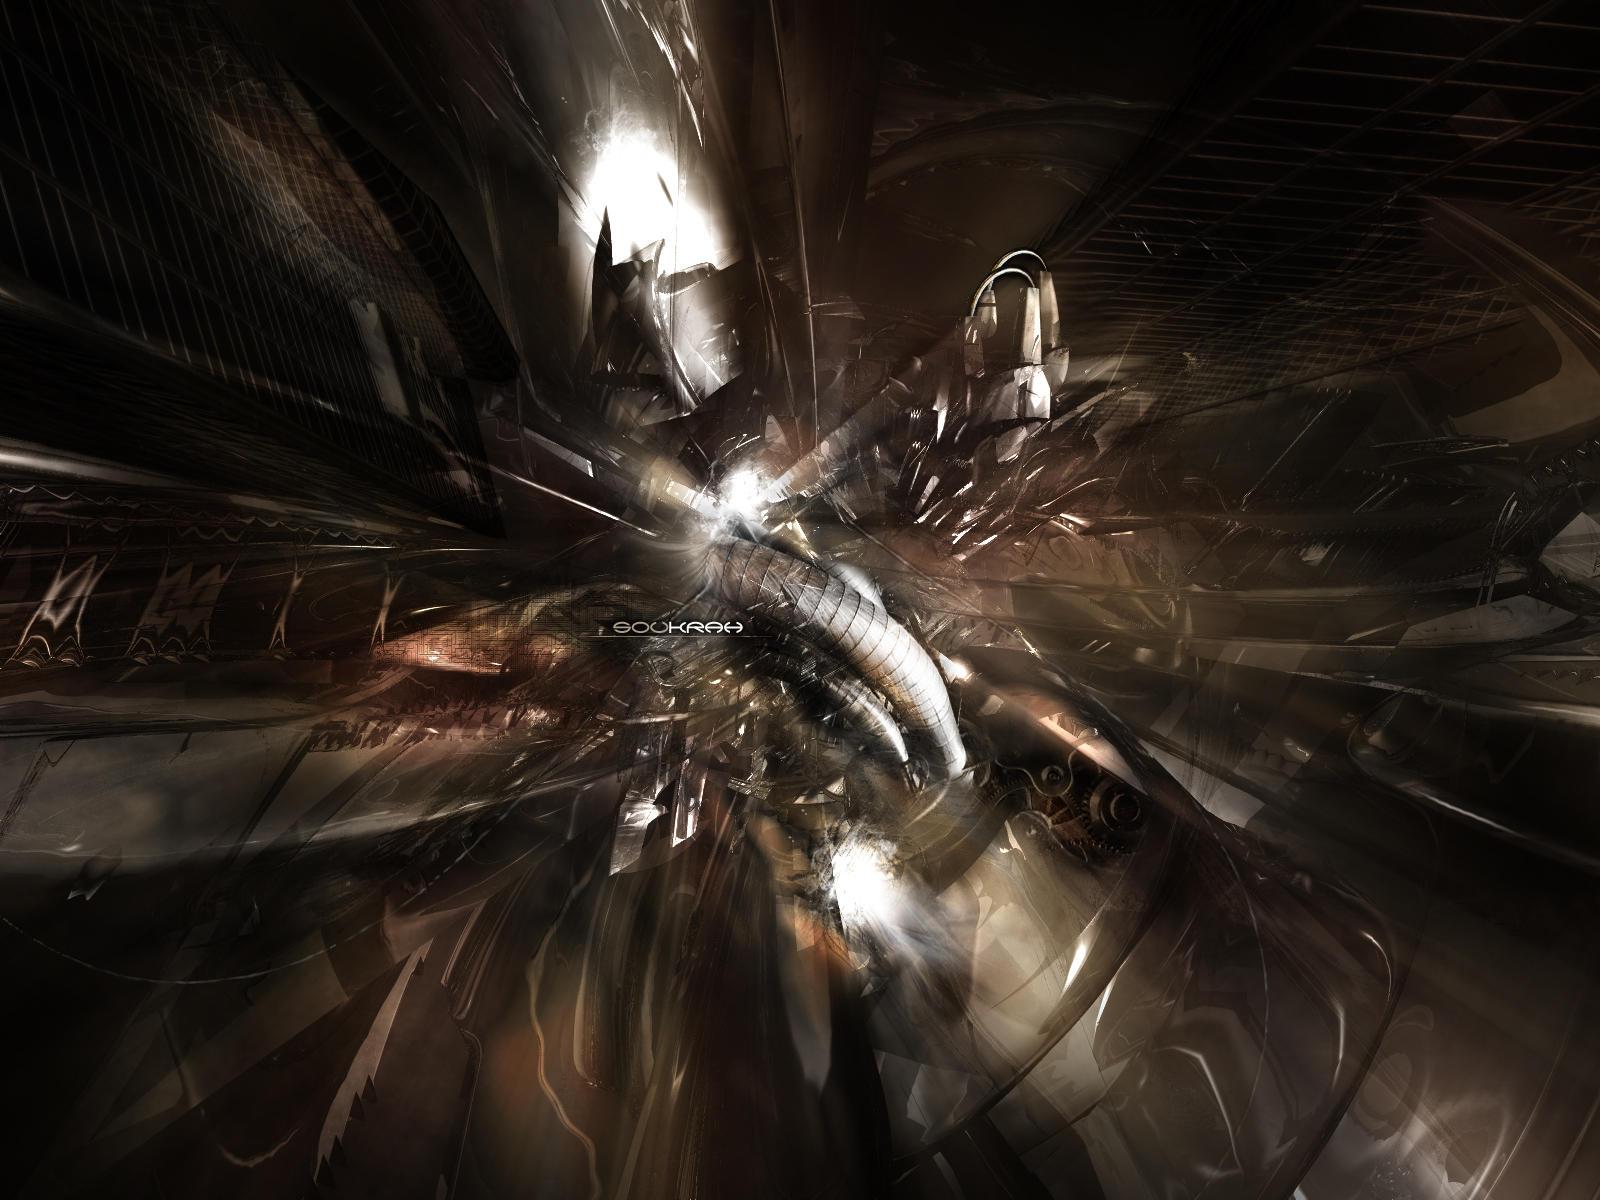 SOUKRAH by viperv6